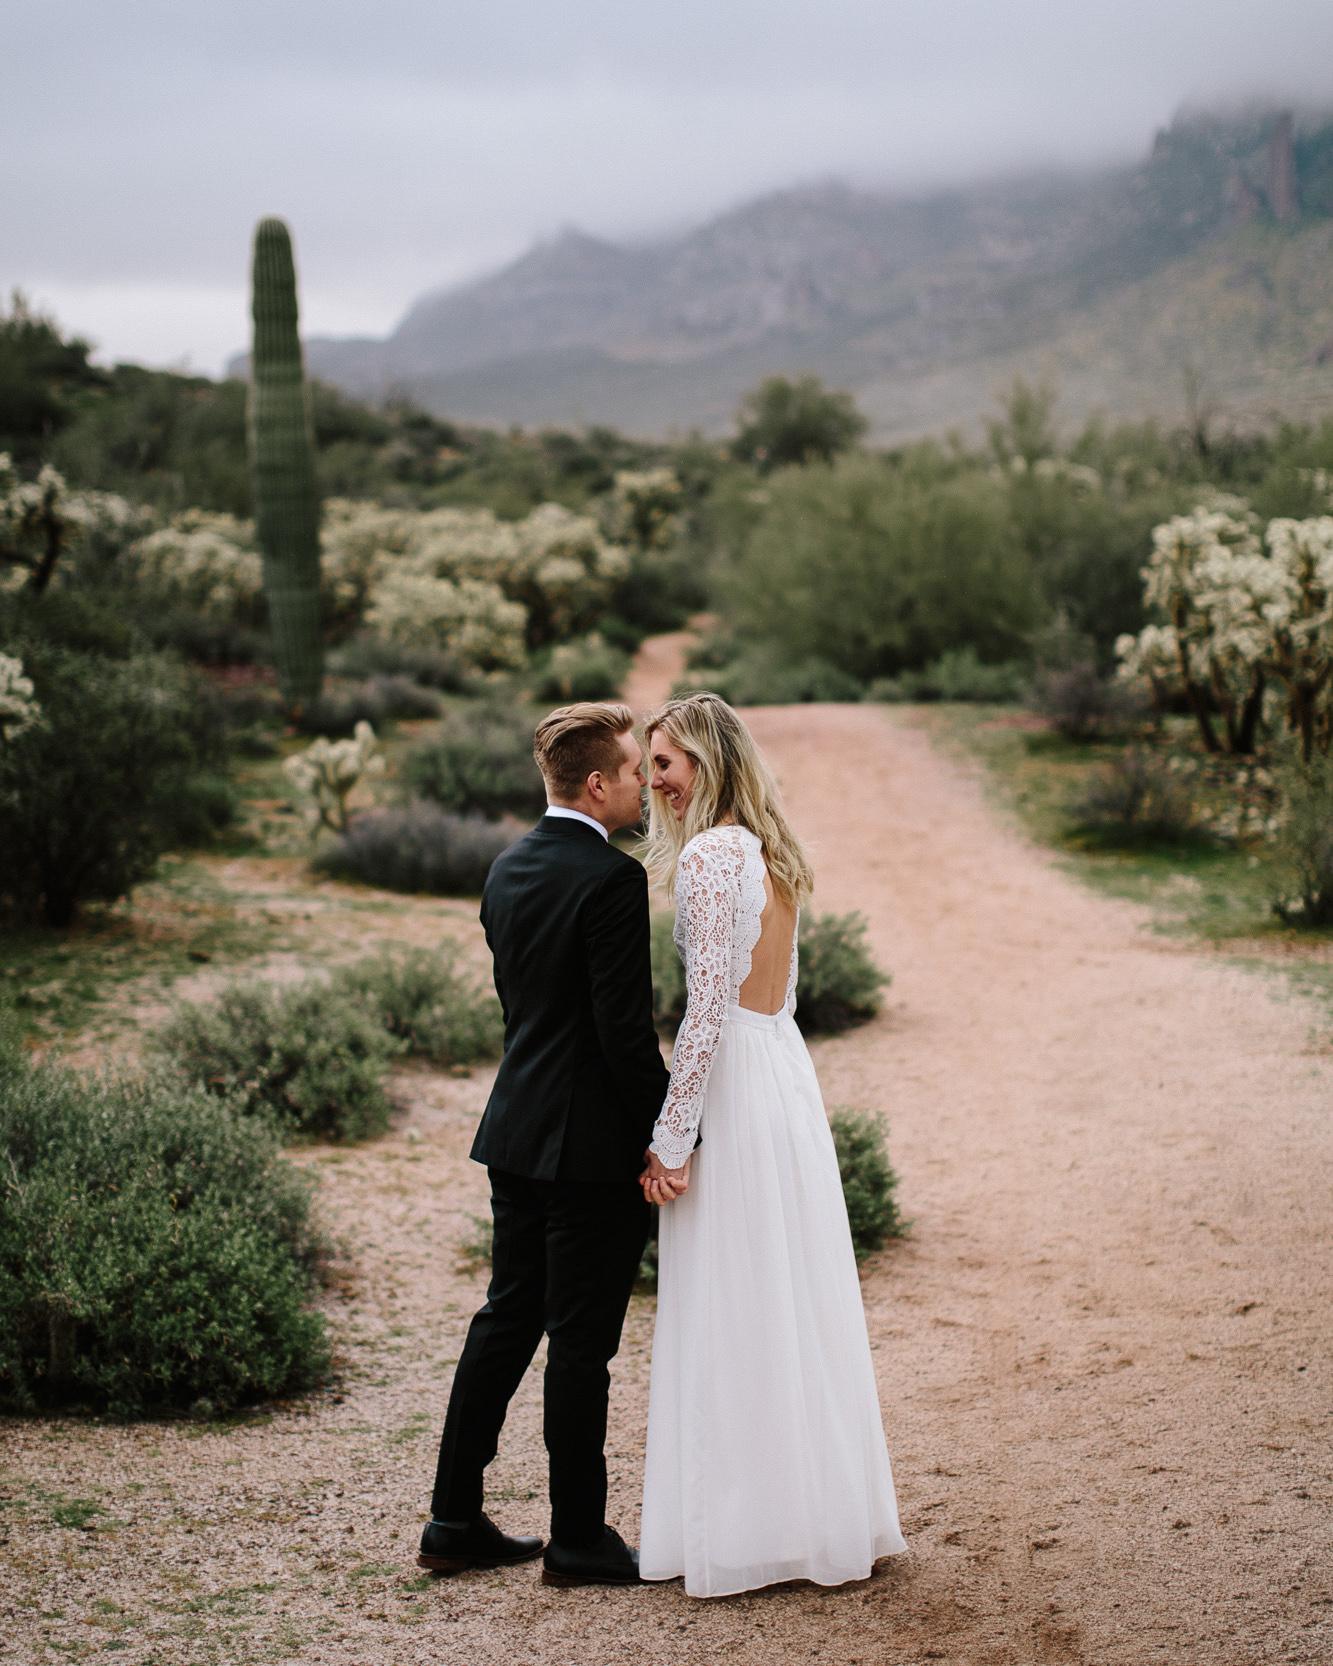 phoenix-mesa-elopement-wedding-photographer-lost-dutchman-state-park-superstitious-mountains-12.jpg